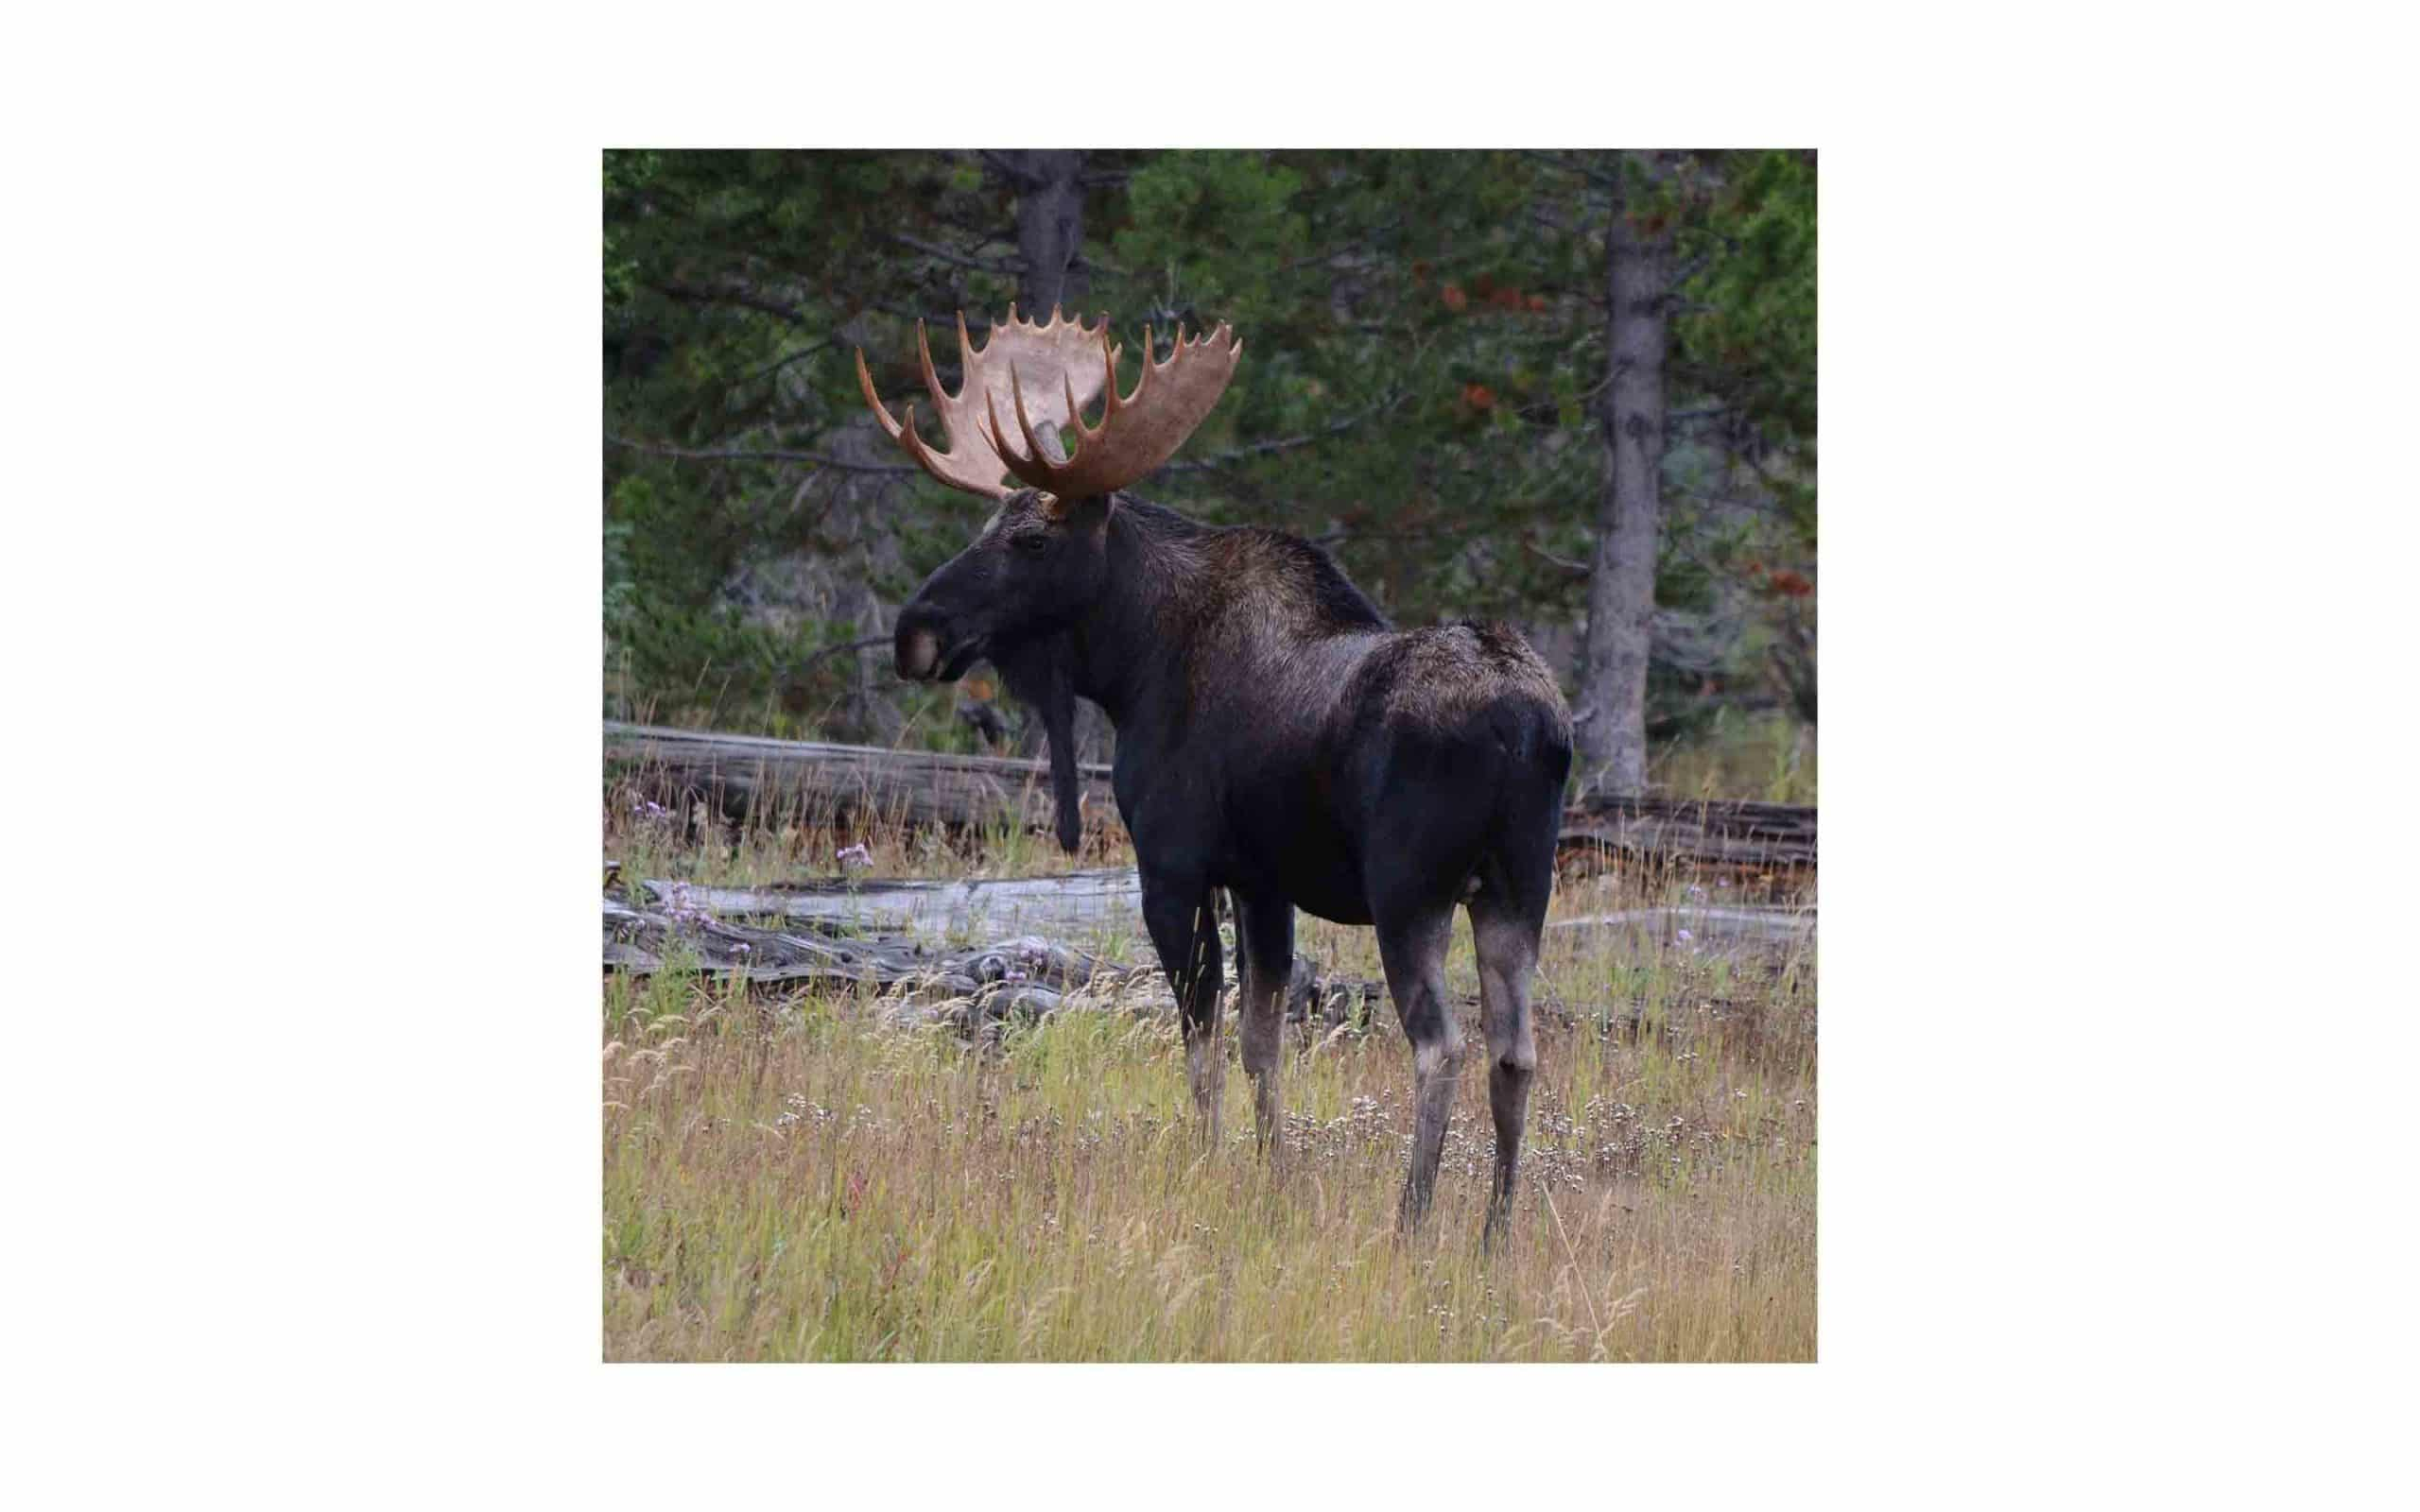 co-moose-Curtis-Elmore.jpg?mtime=20170811134653#asset:6292